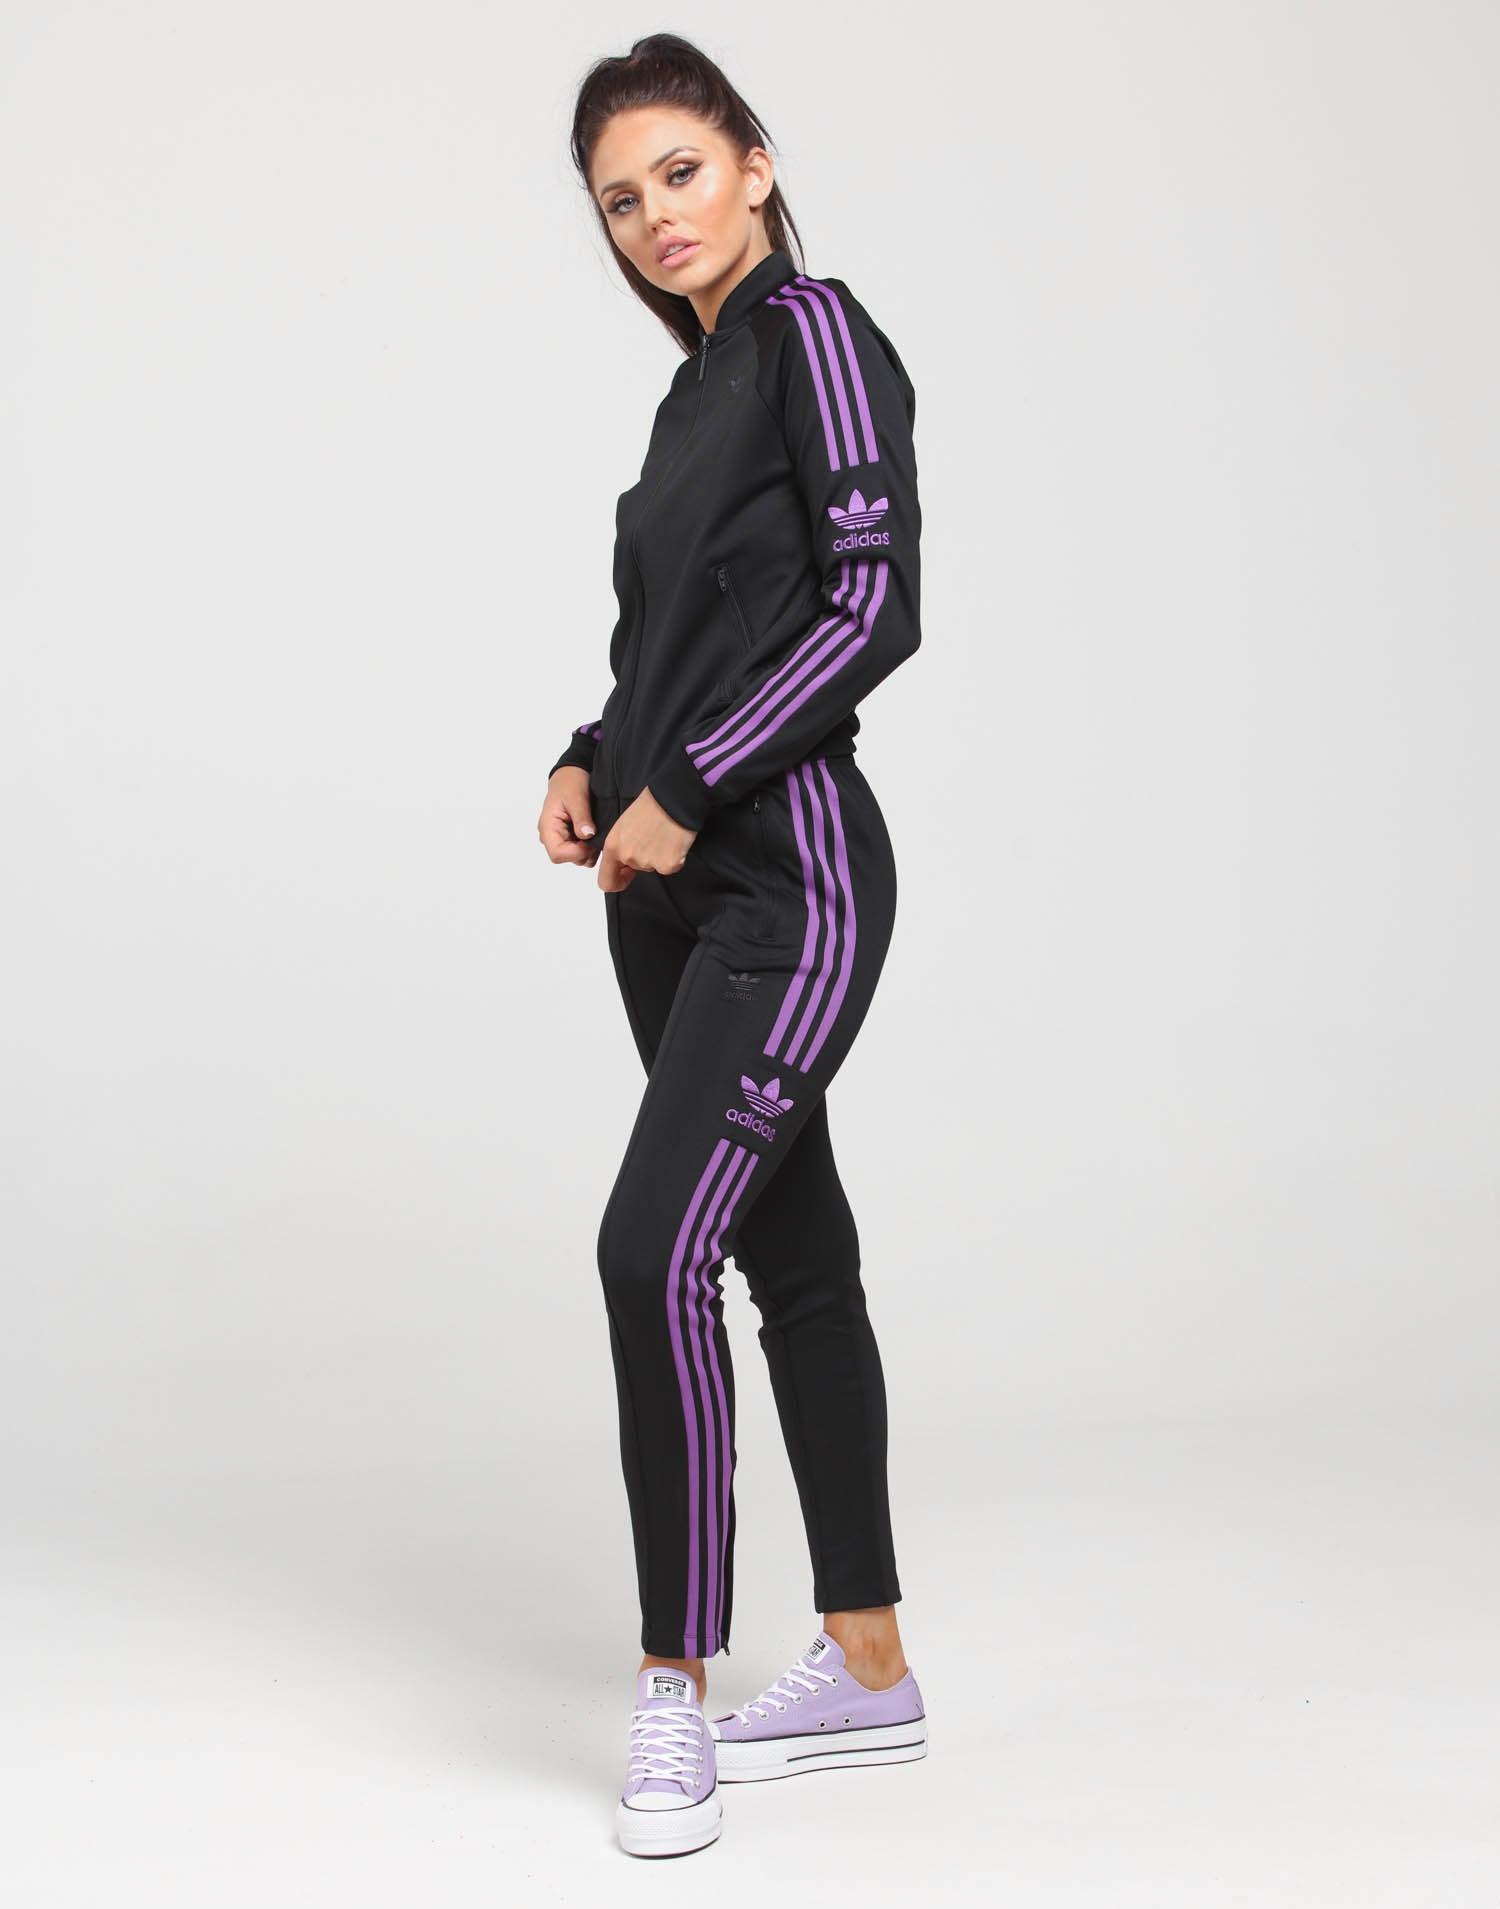 Women's Adidas velour tracksuit Both size s Never Depop